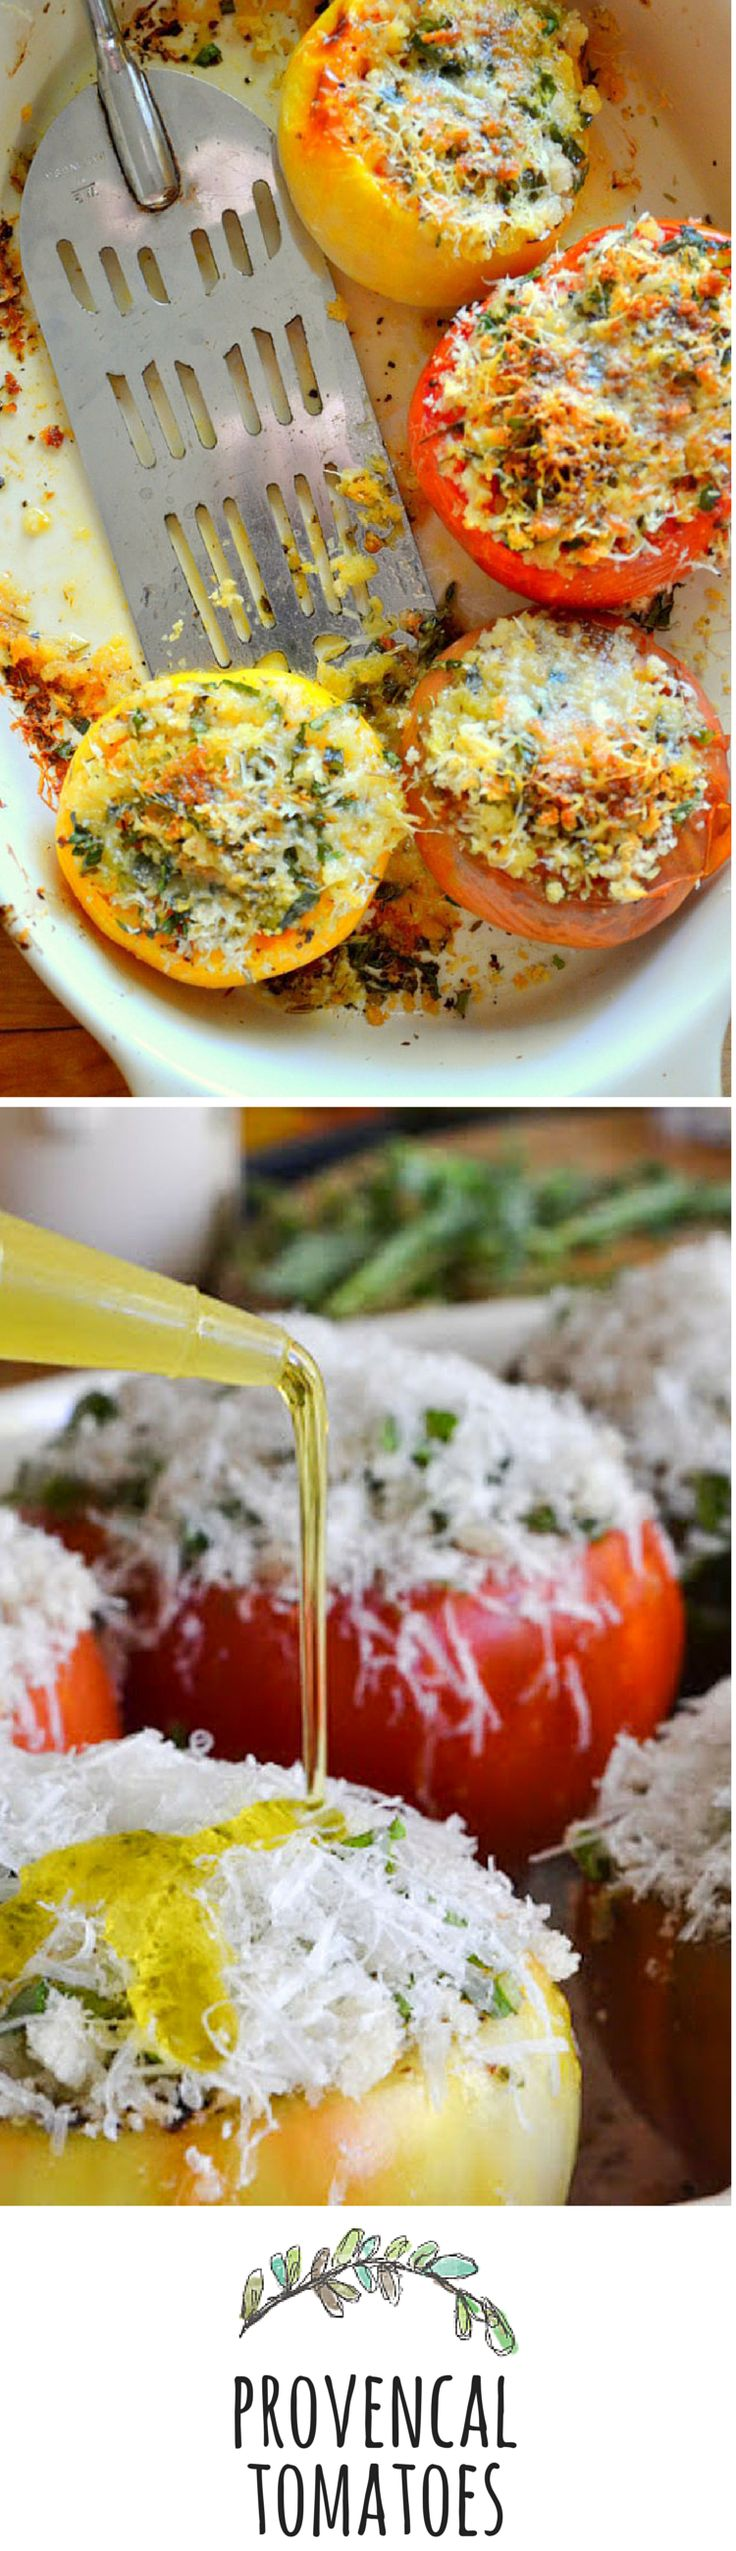 These super simple stuffed tomatoes make an elegant side dish!